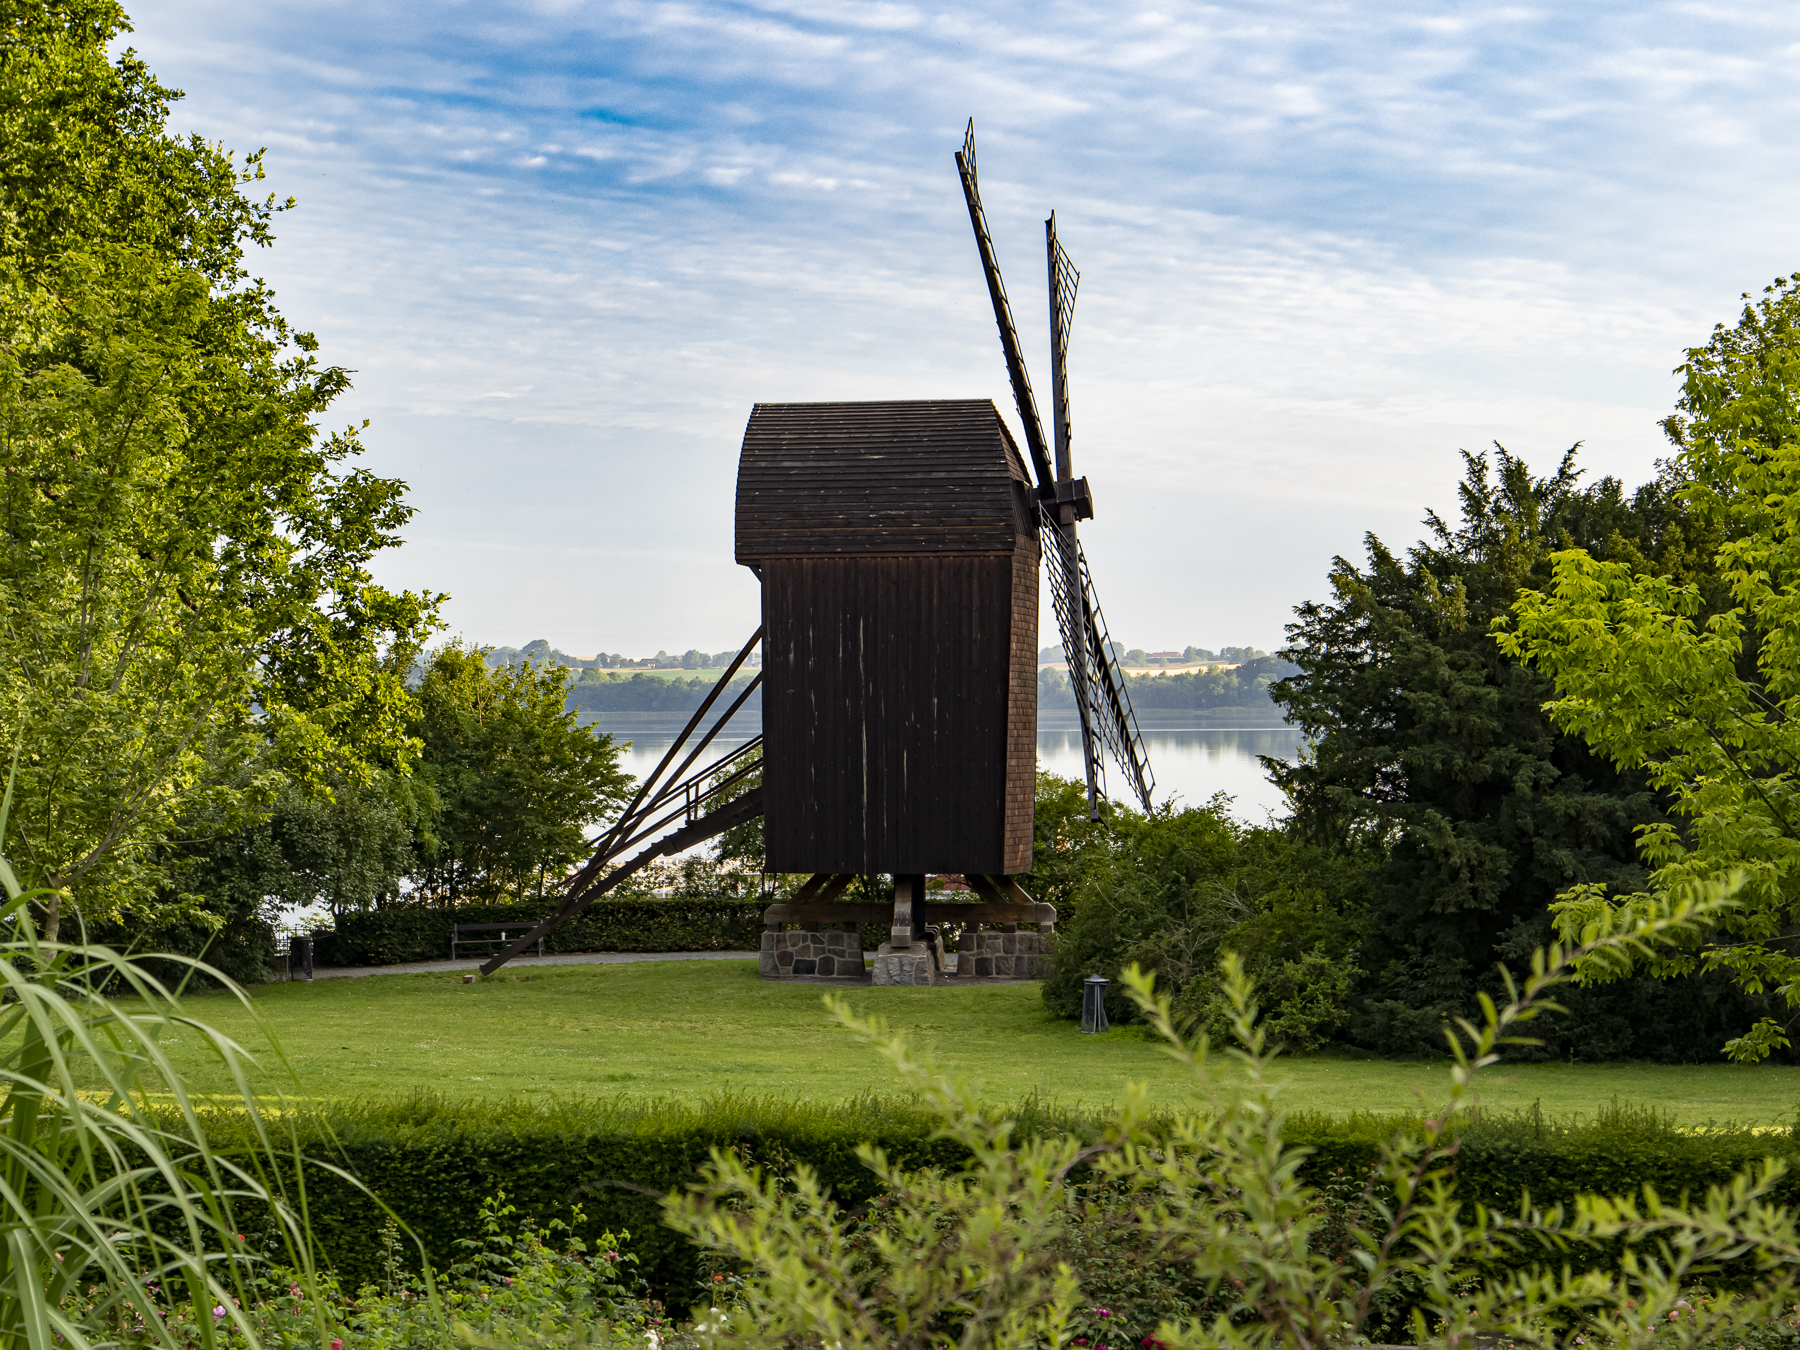 Søndersted stubmølle i Holbæk